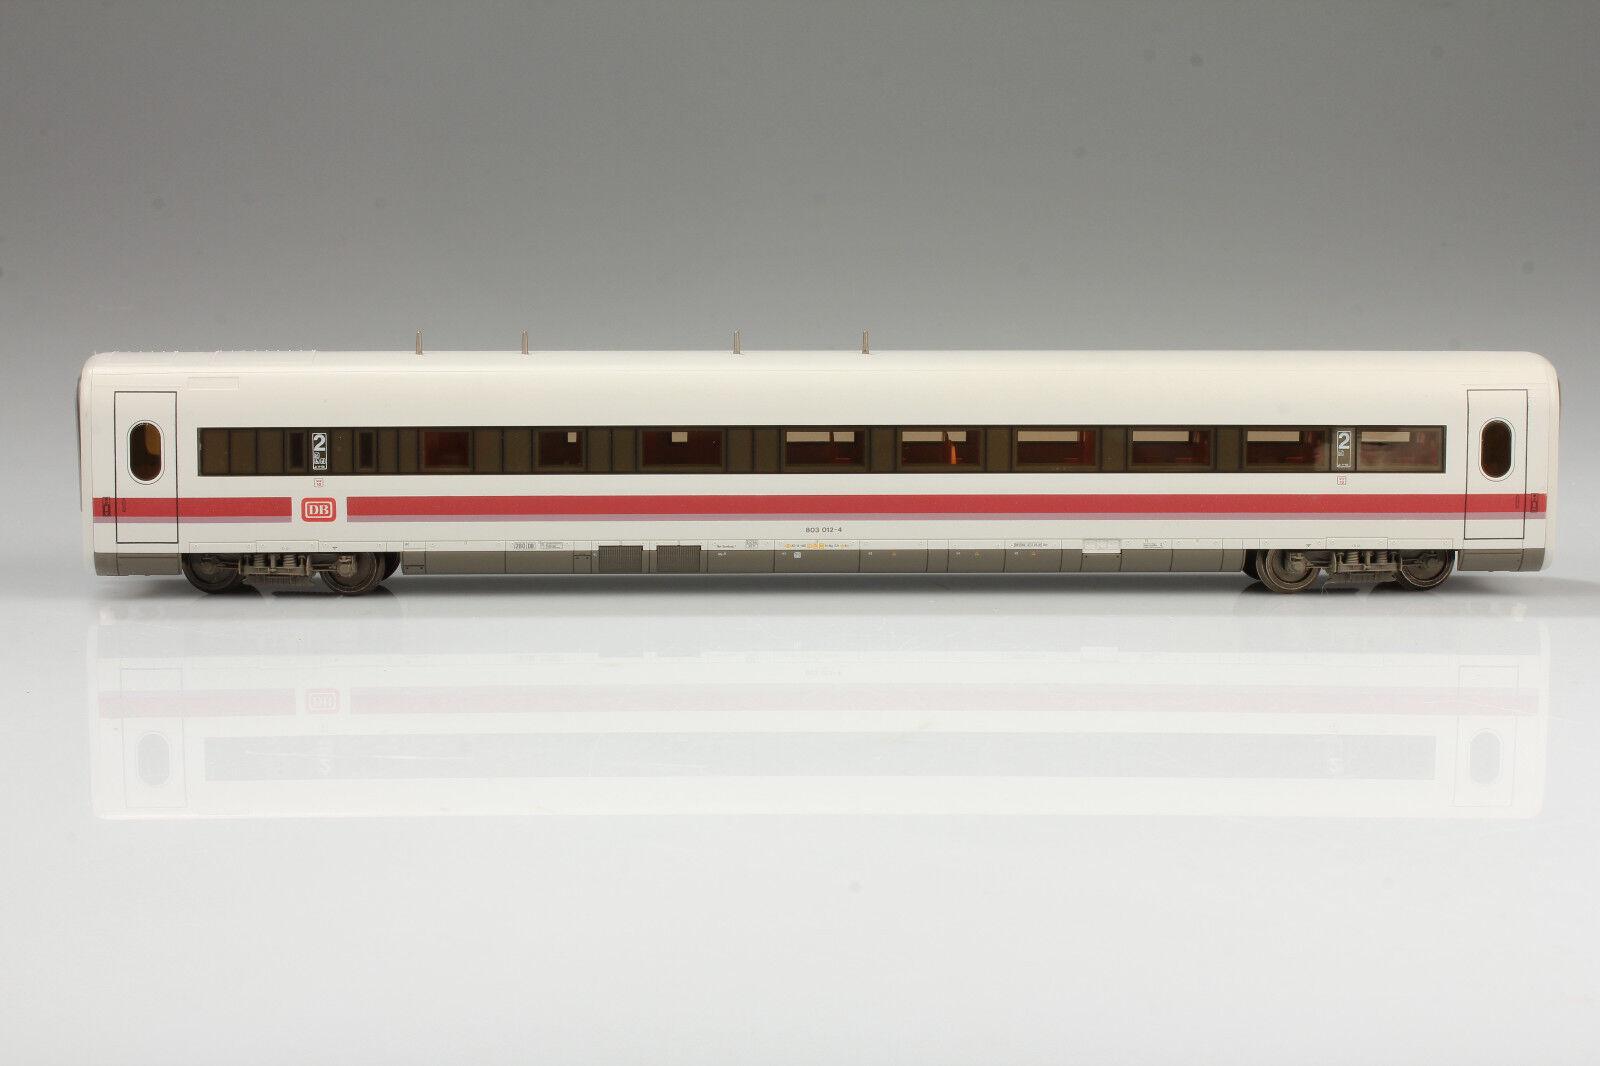 H0 Fleischmann 4445 Ice Centre Wagon 803 012-4 Dirt Scratches without Original